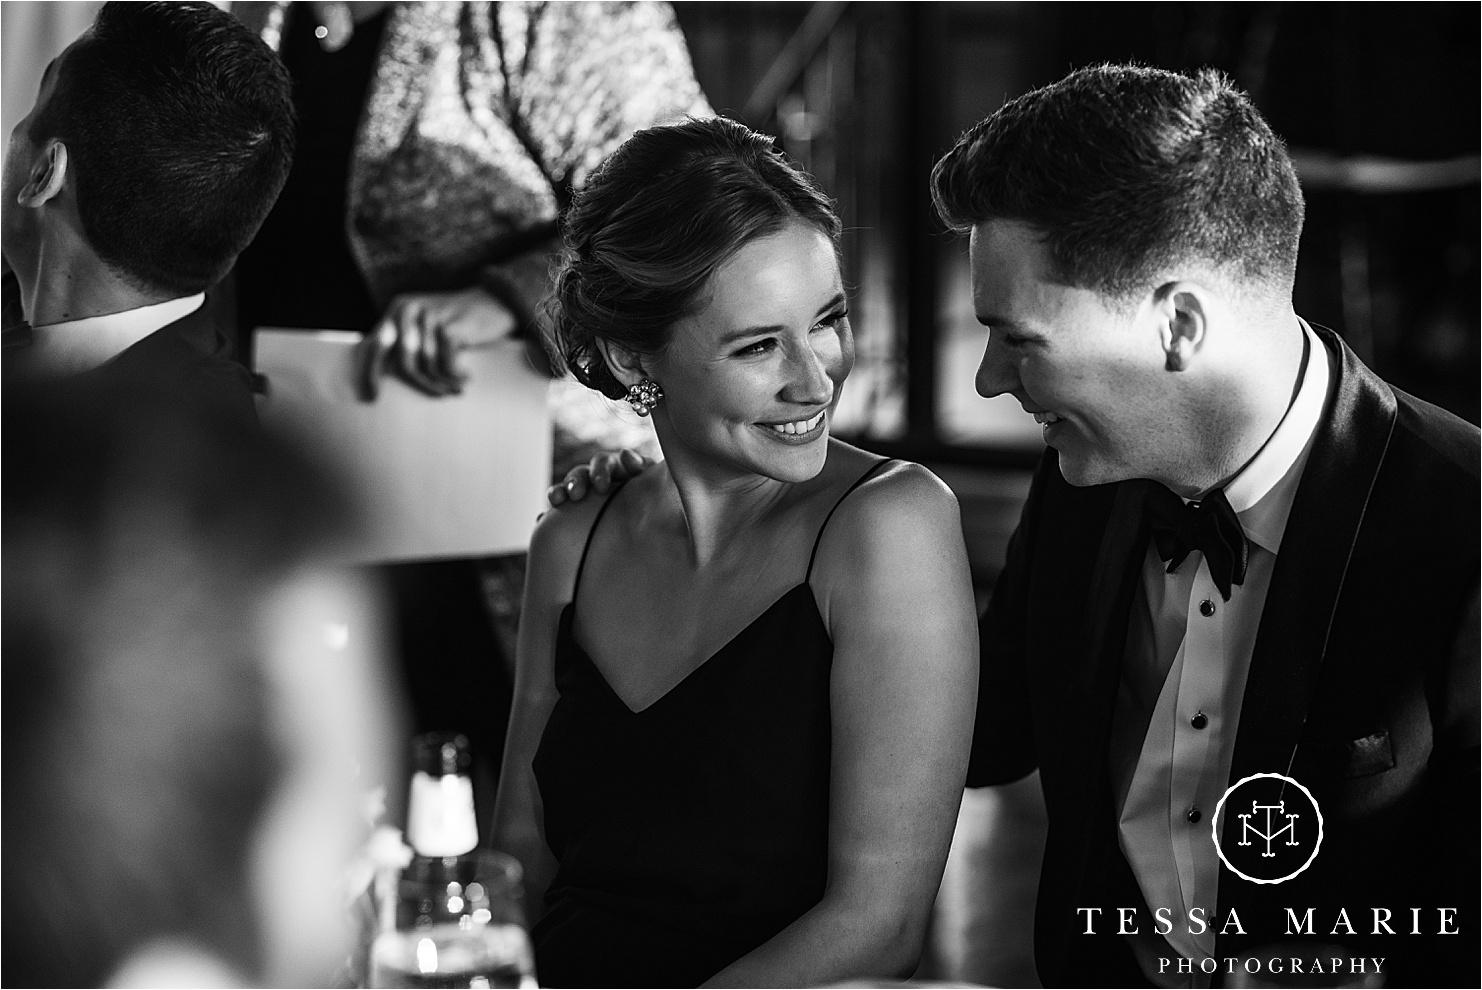 Tessa_marie_weddings_houston_wedding_photographer_The_astorian_0153.jpg